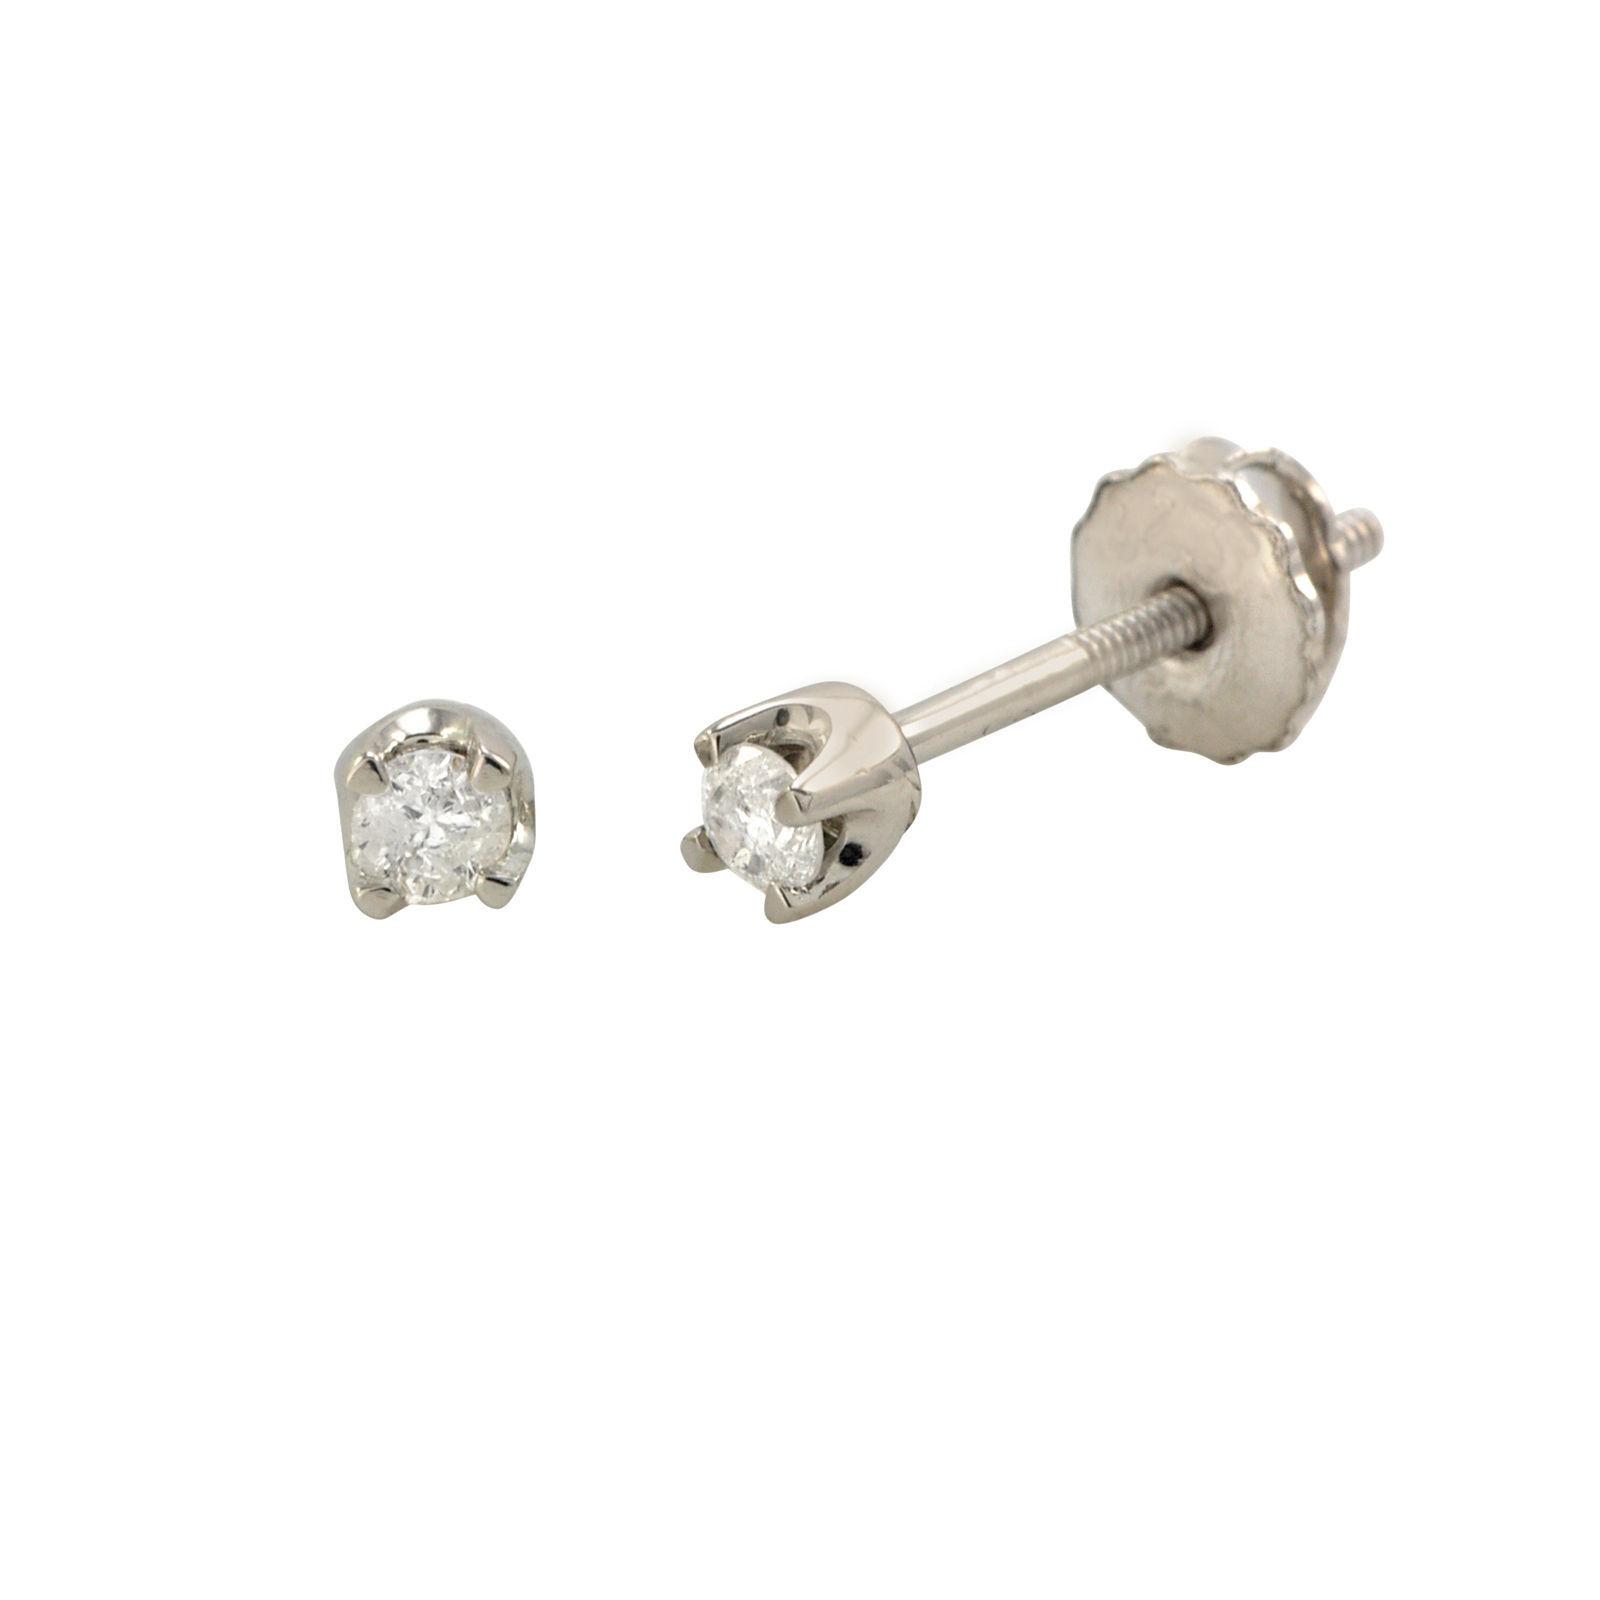 diamond stud earrings 10 cttw i j i2 i3 925 sterling. Black Bedroom Furniture Sets. Home Design Ideas